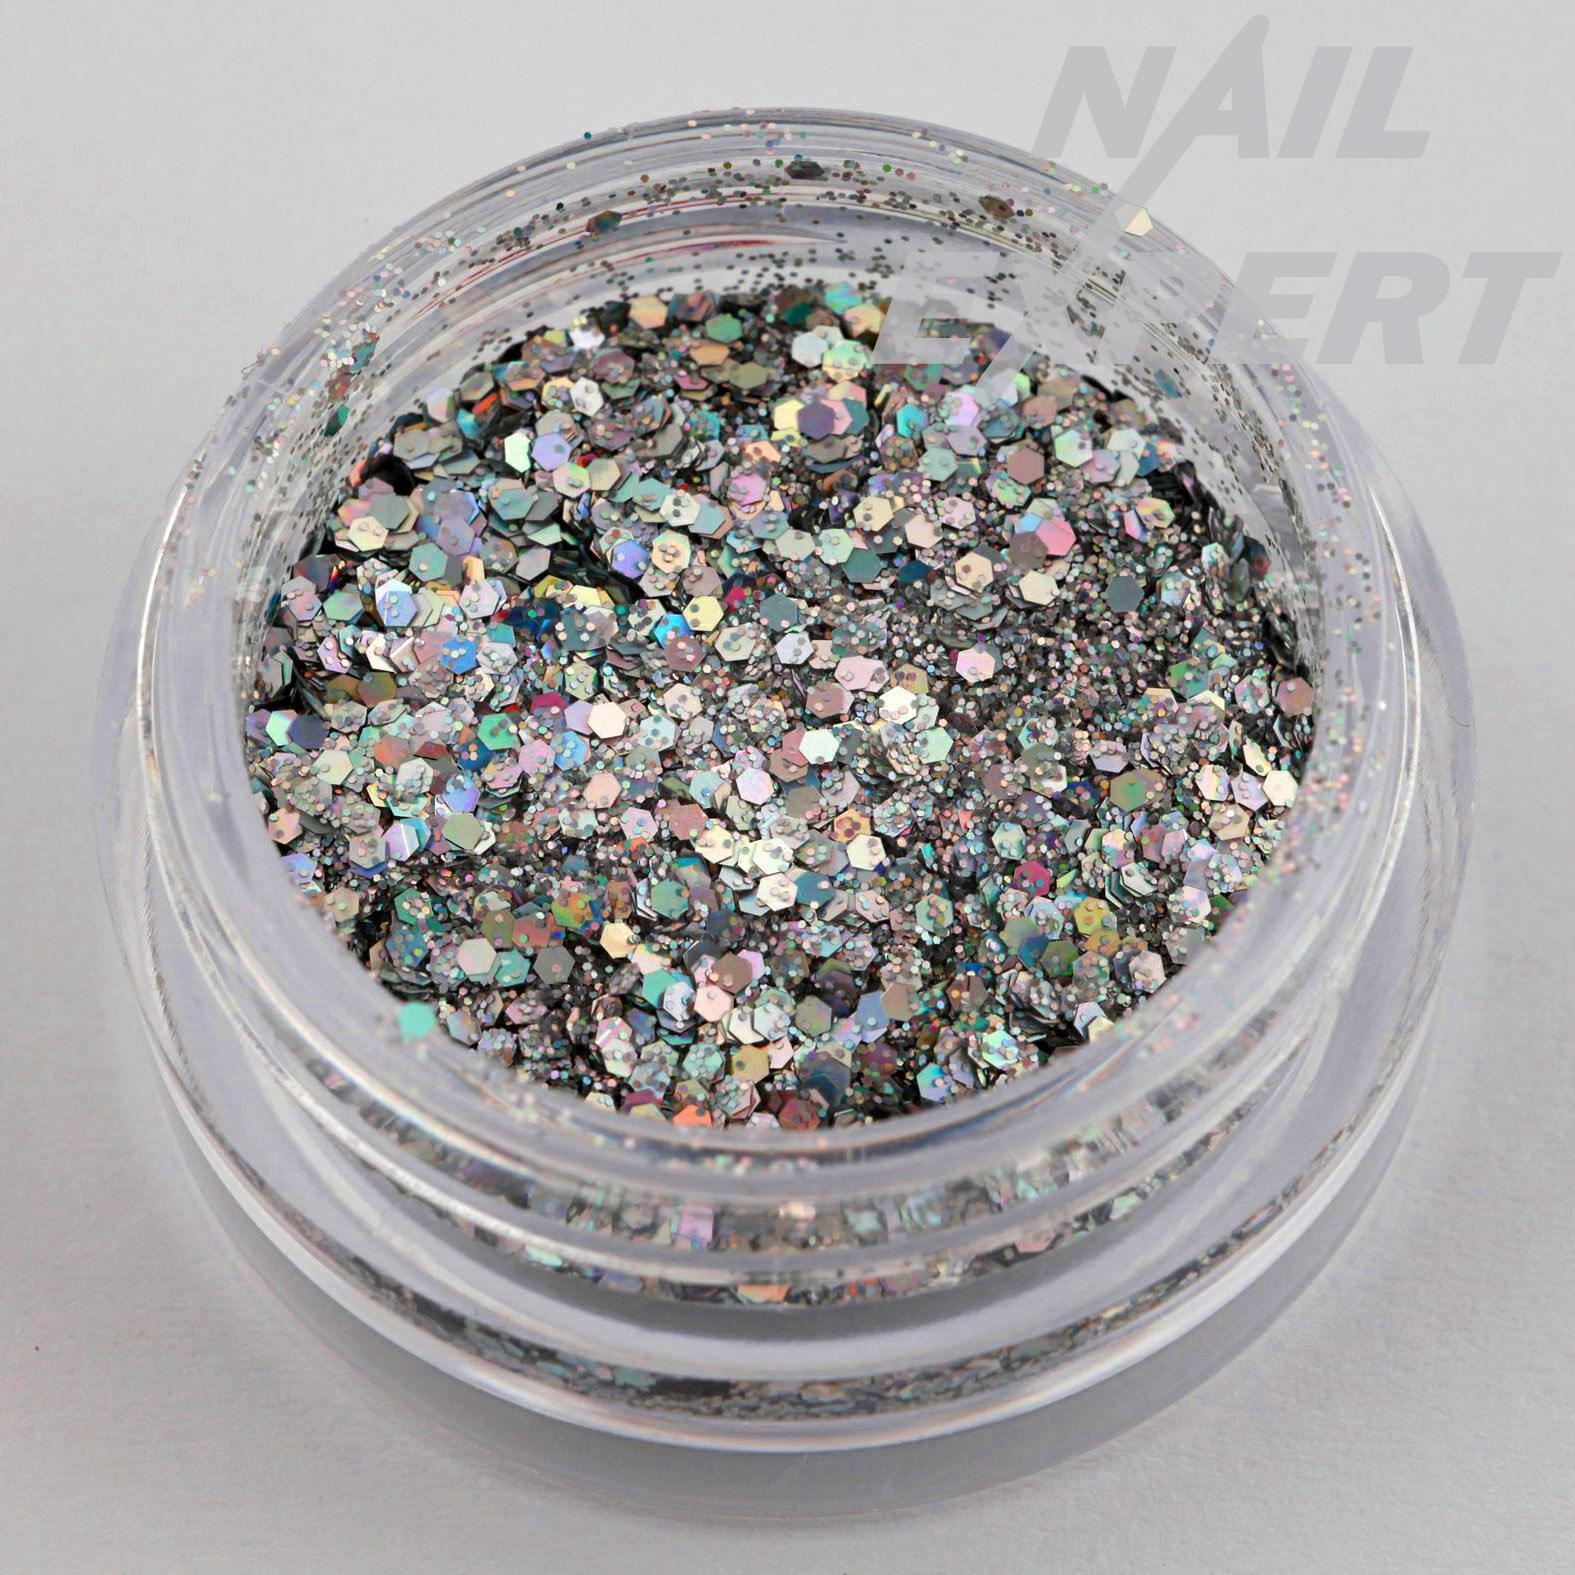 Nail Expert Sparkling glitter 1010